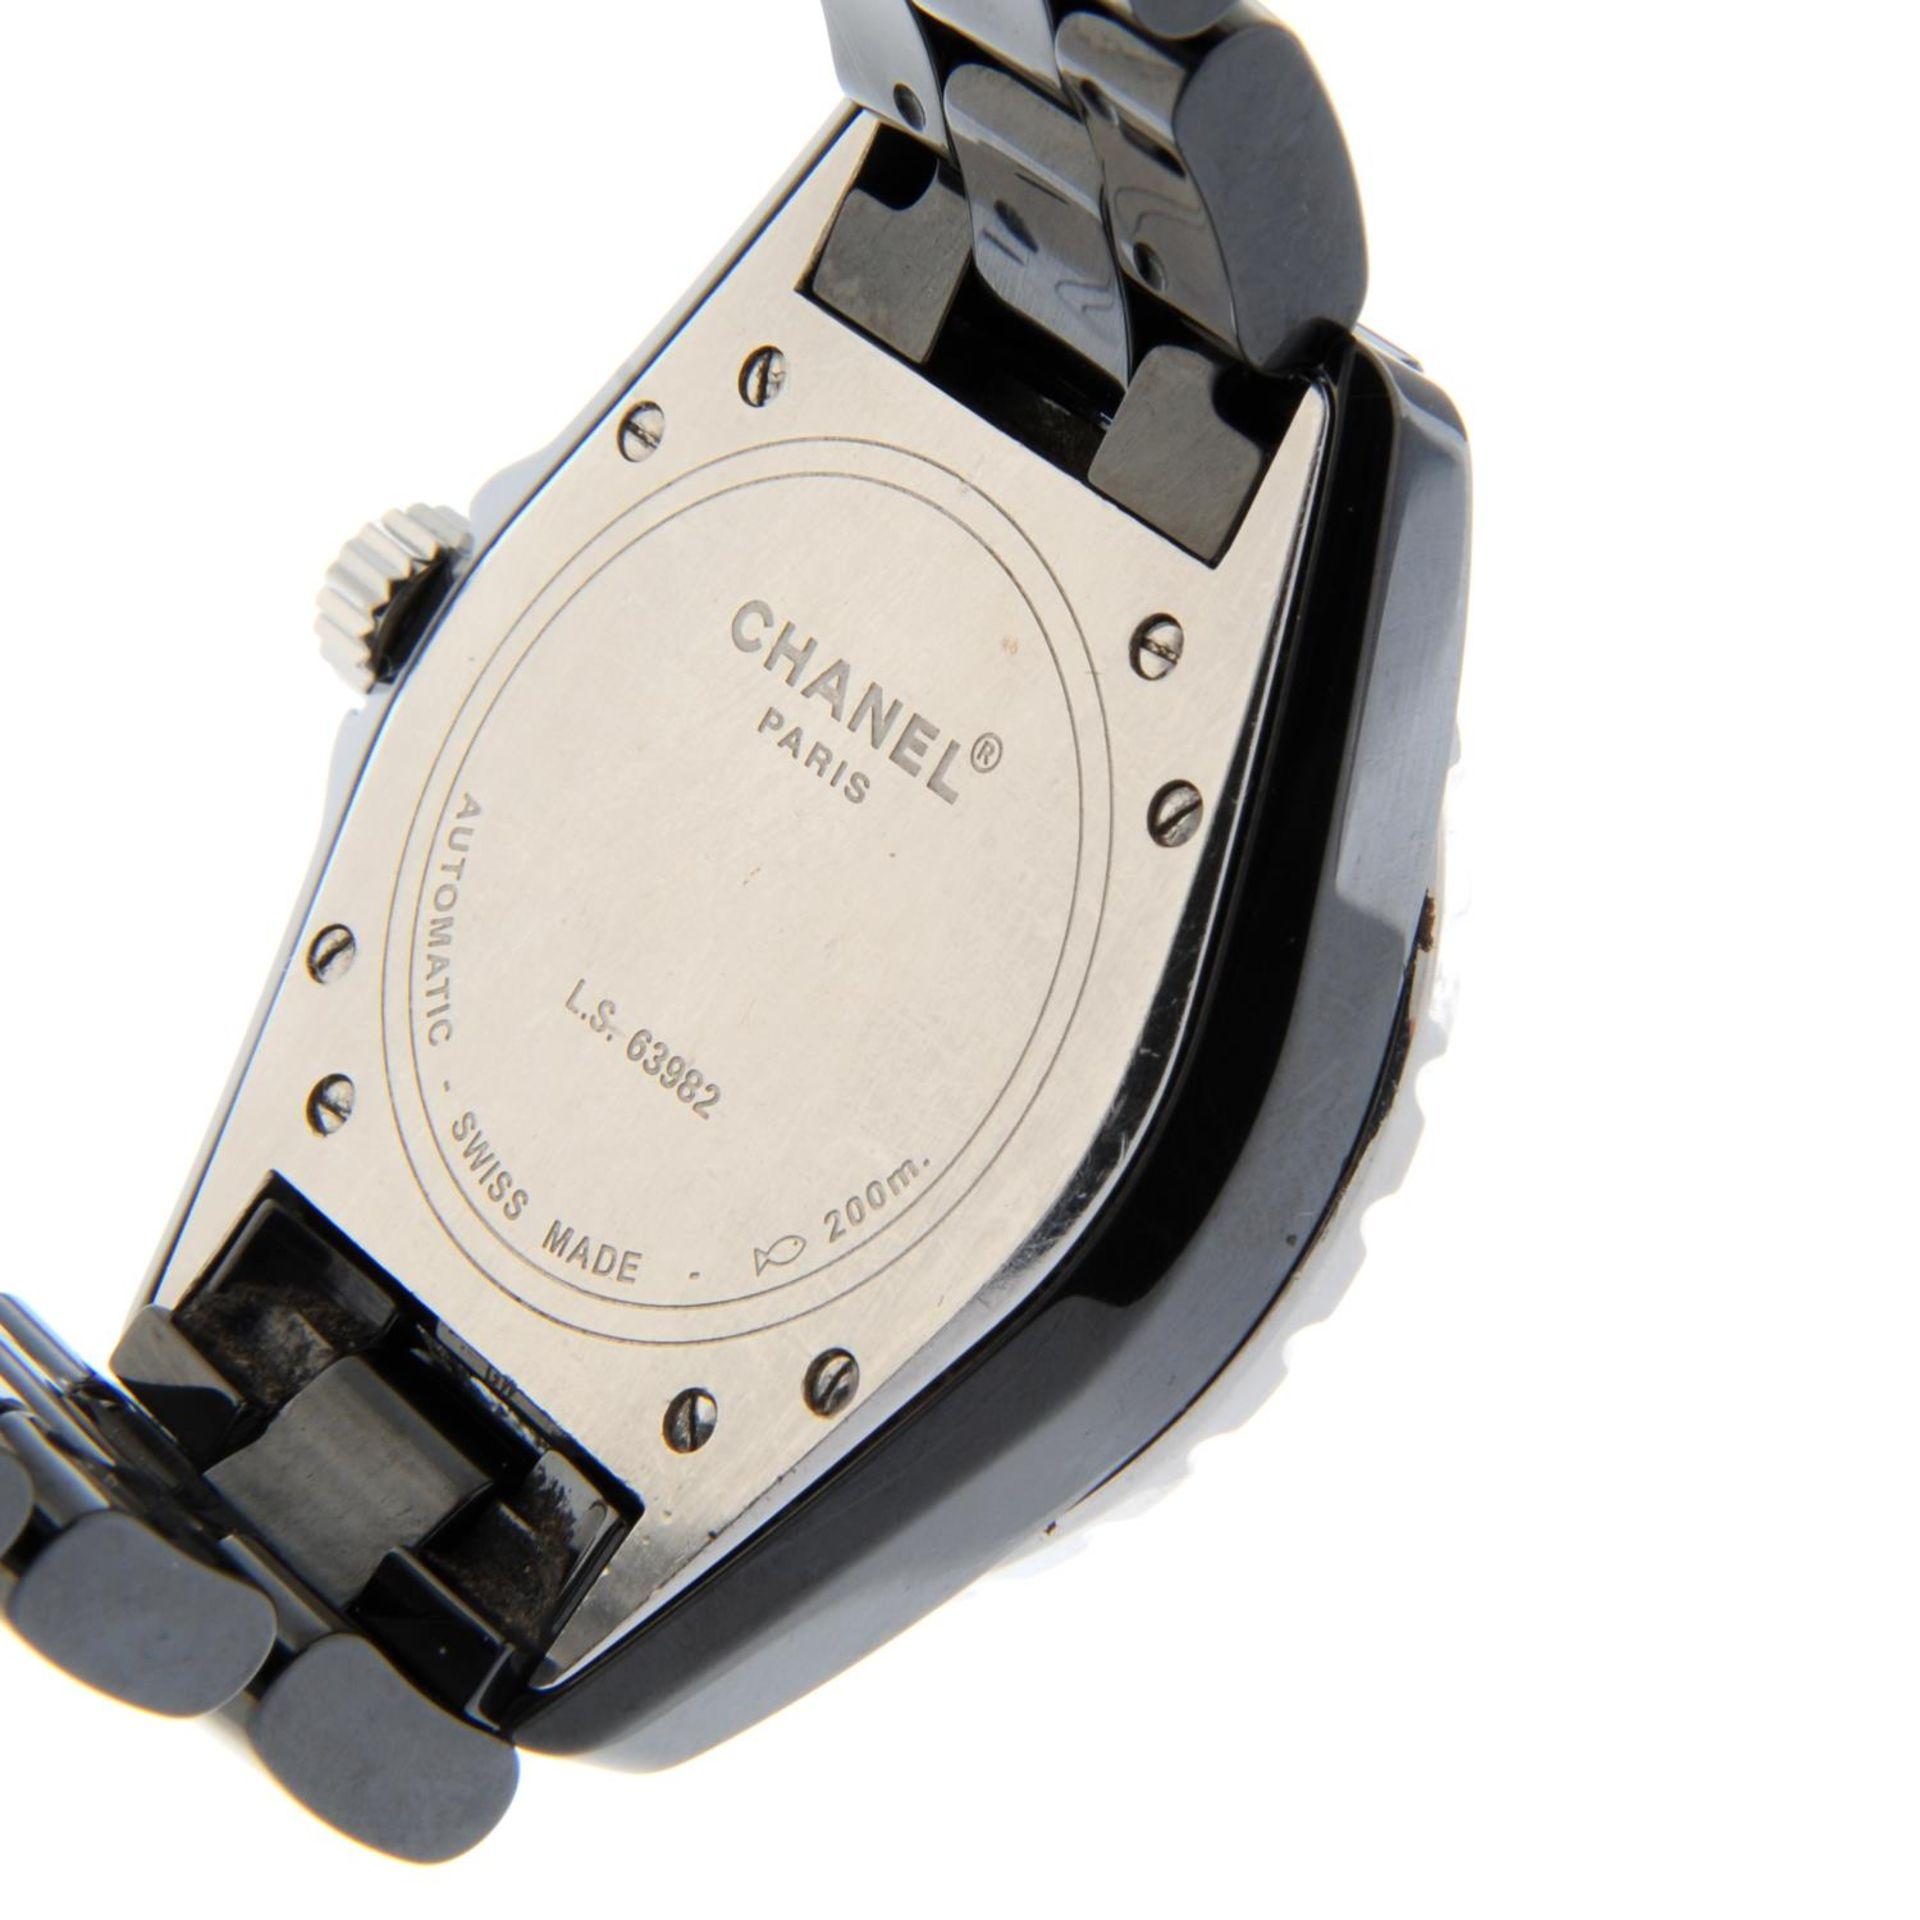 CHANEL - a J12 bracelet watch. - Bild 5 aus 5